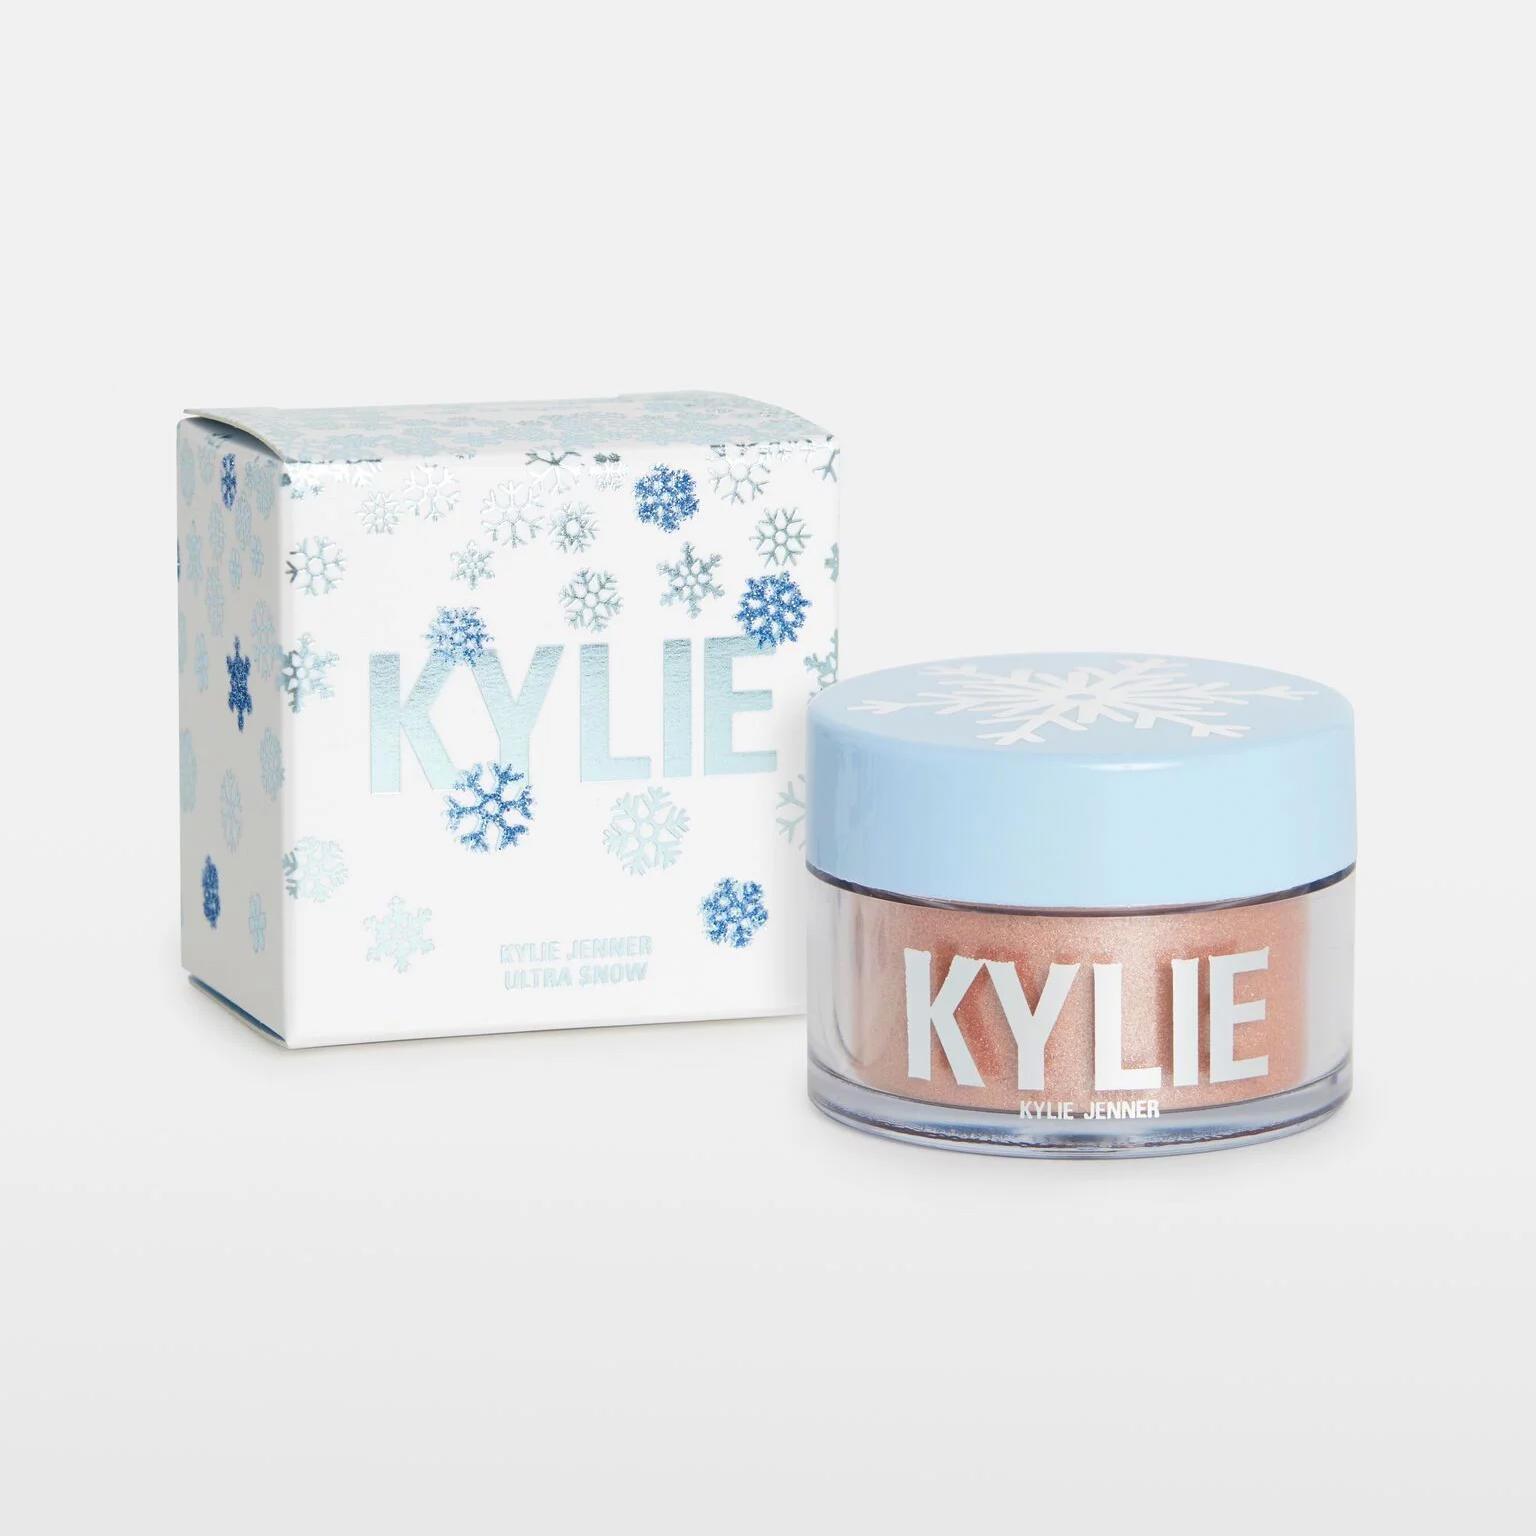 Kylie Cosmetics Merry Bright Ultra Snow Highlighter